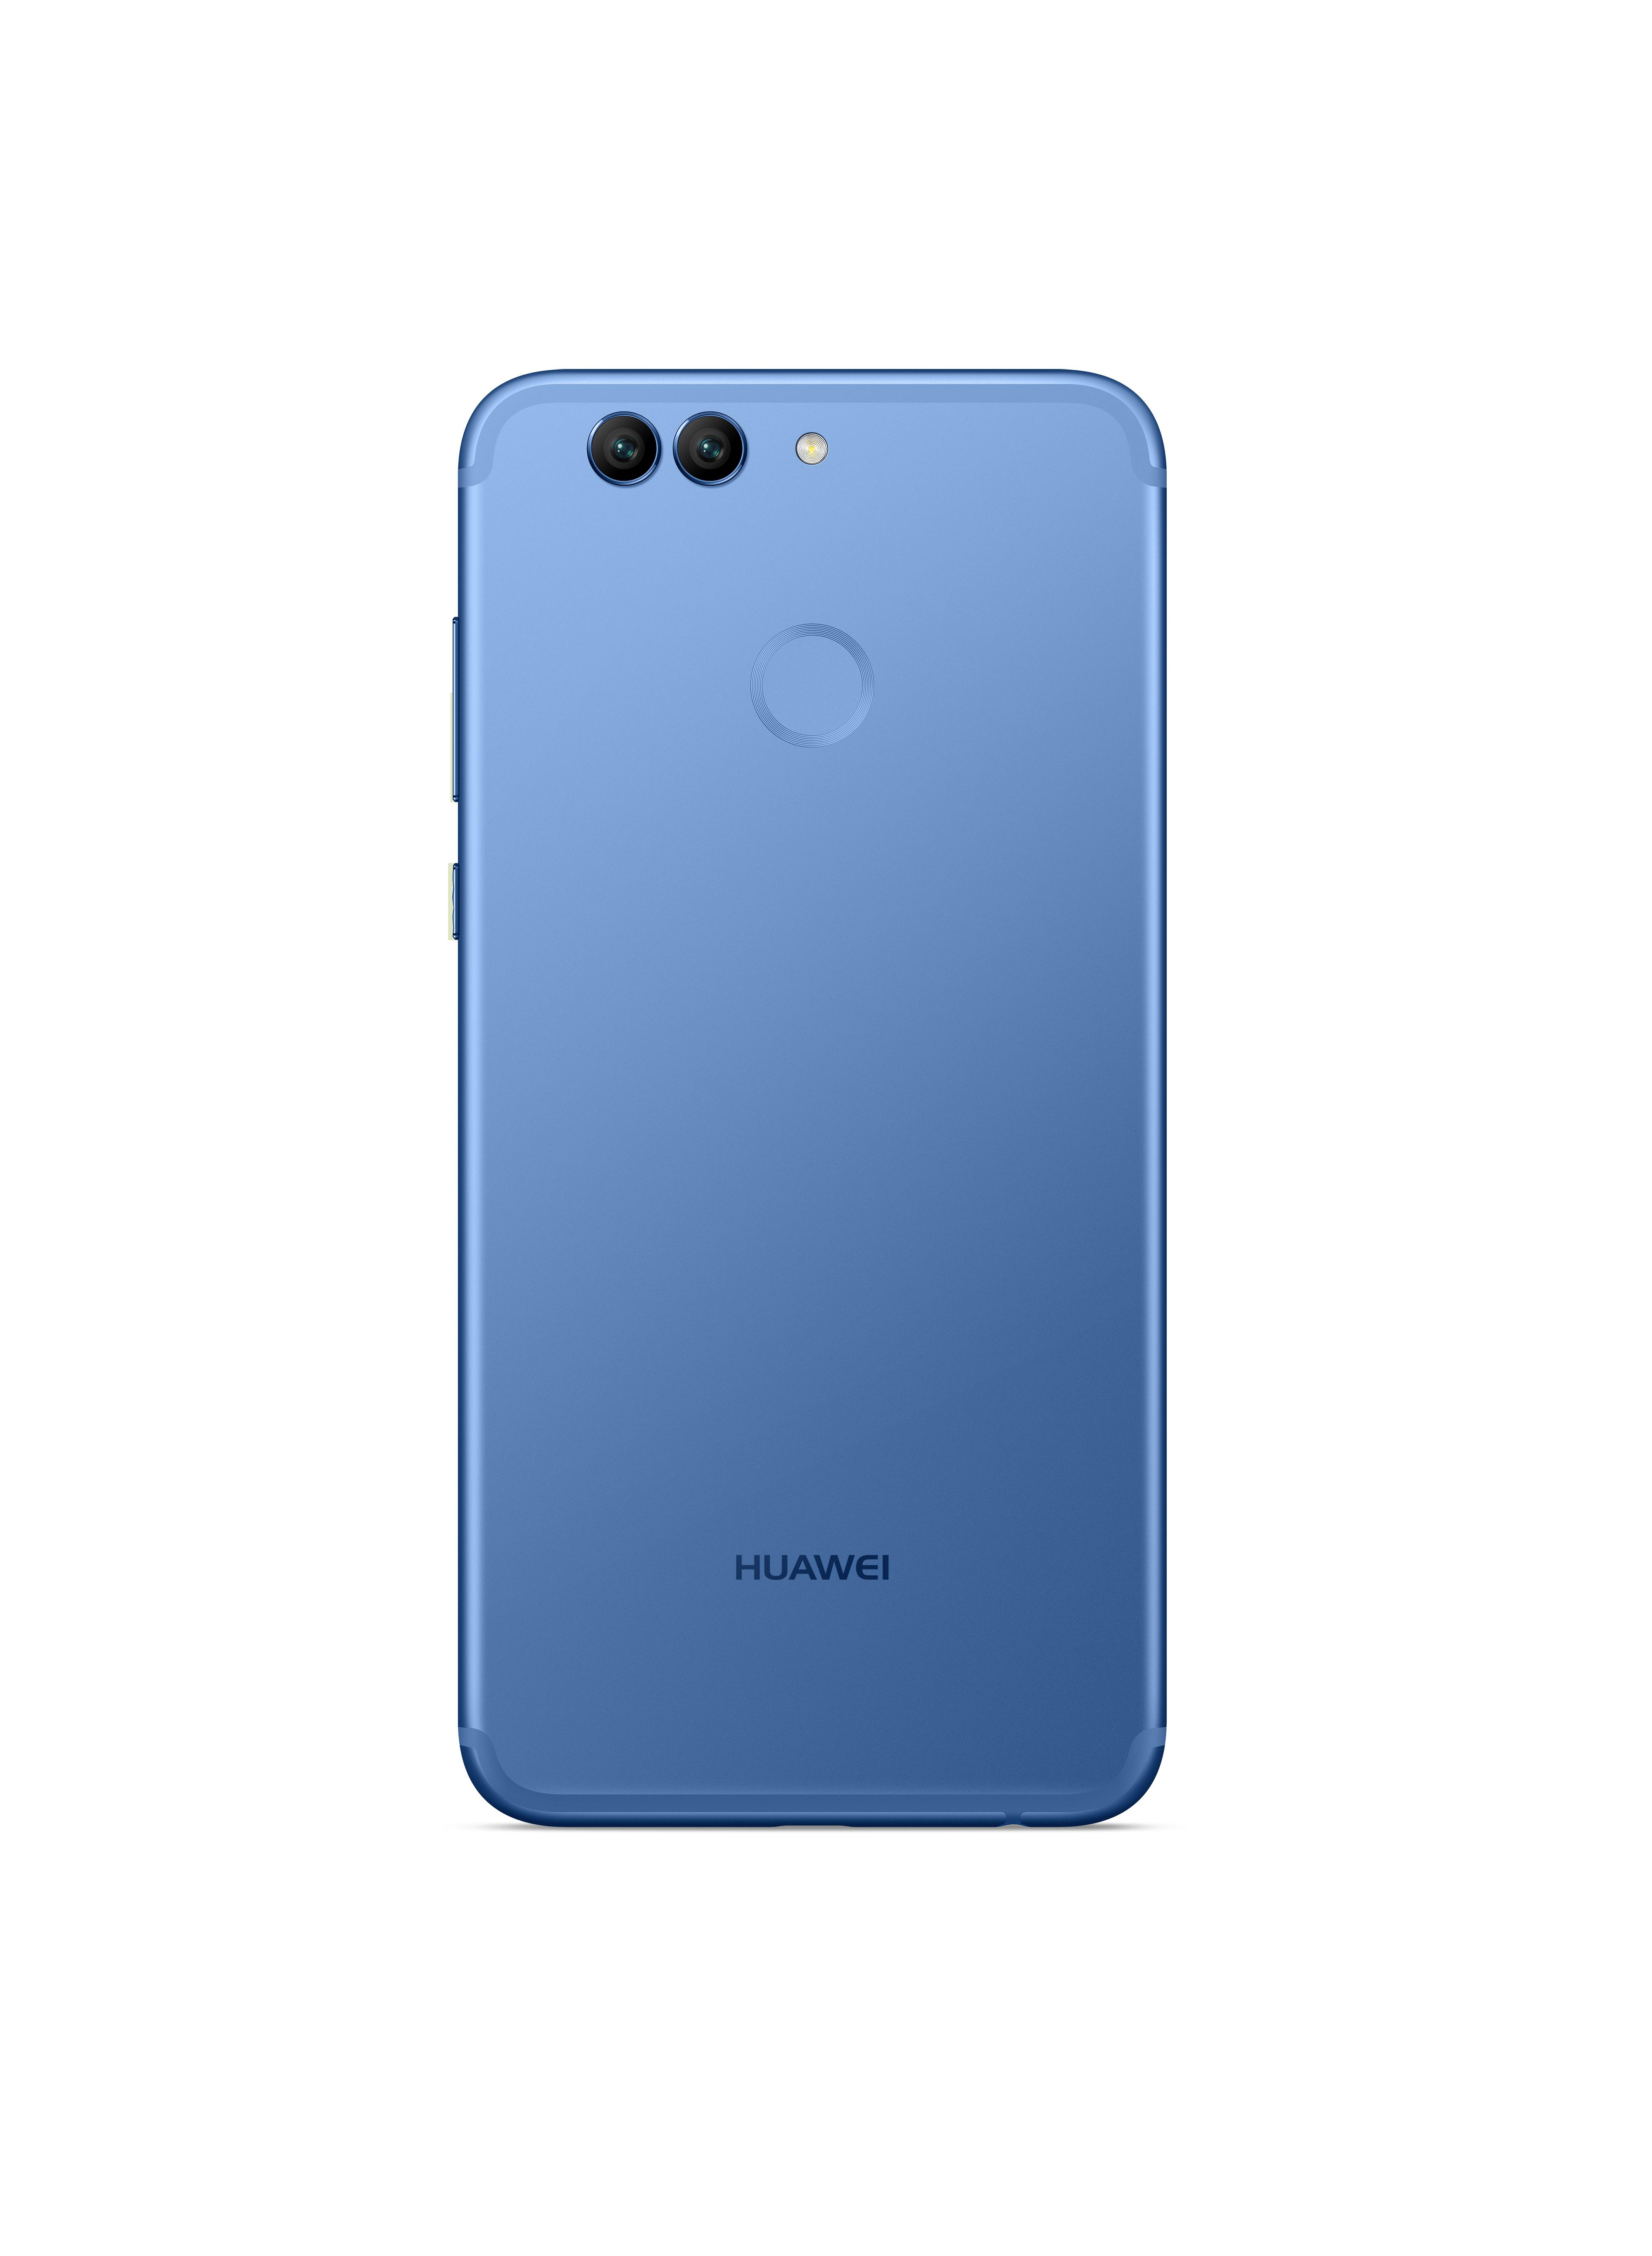 Huawei presenta su nuevo Huawei P10 Selfie